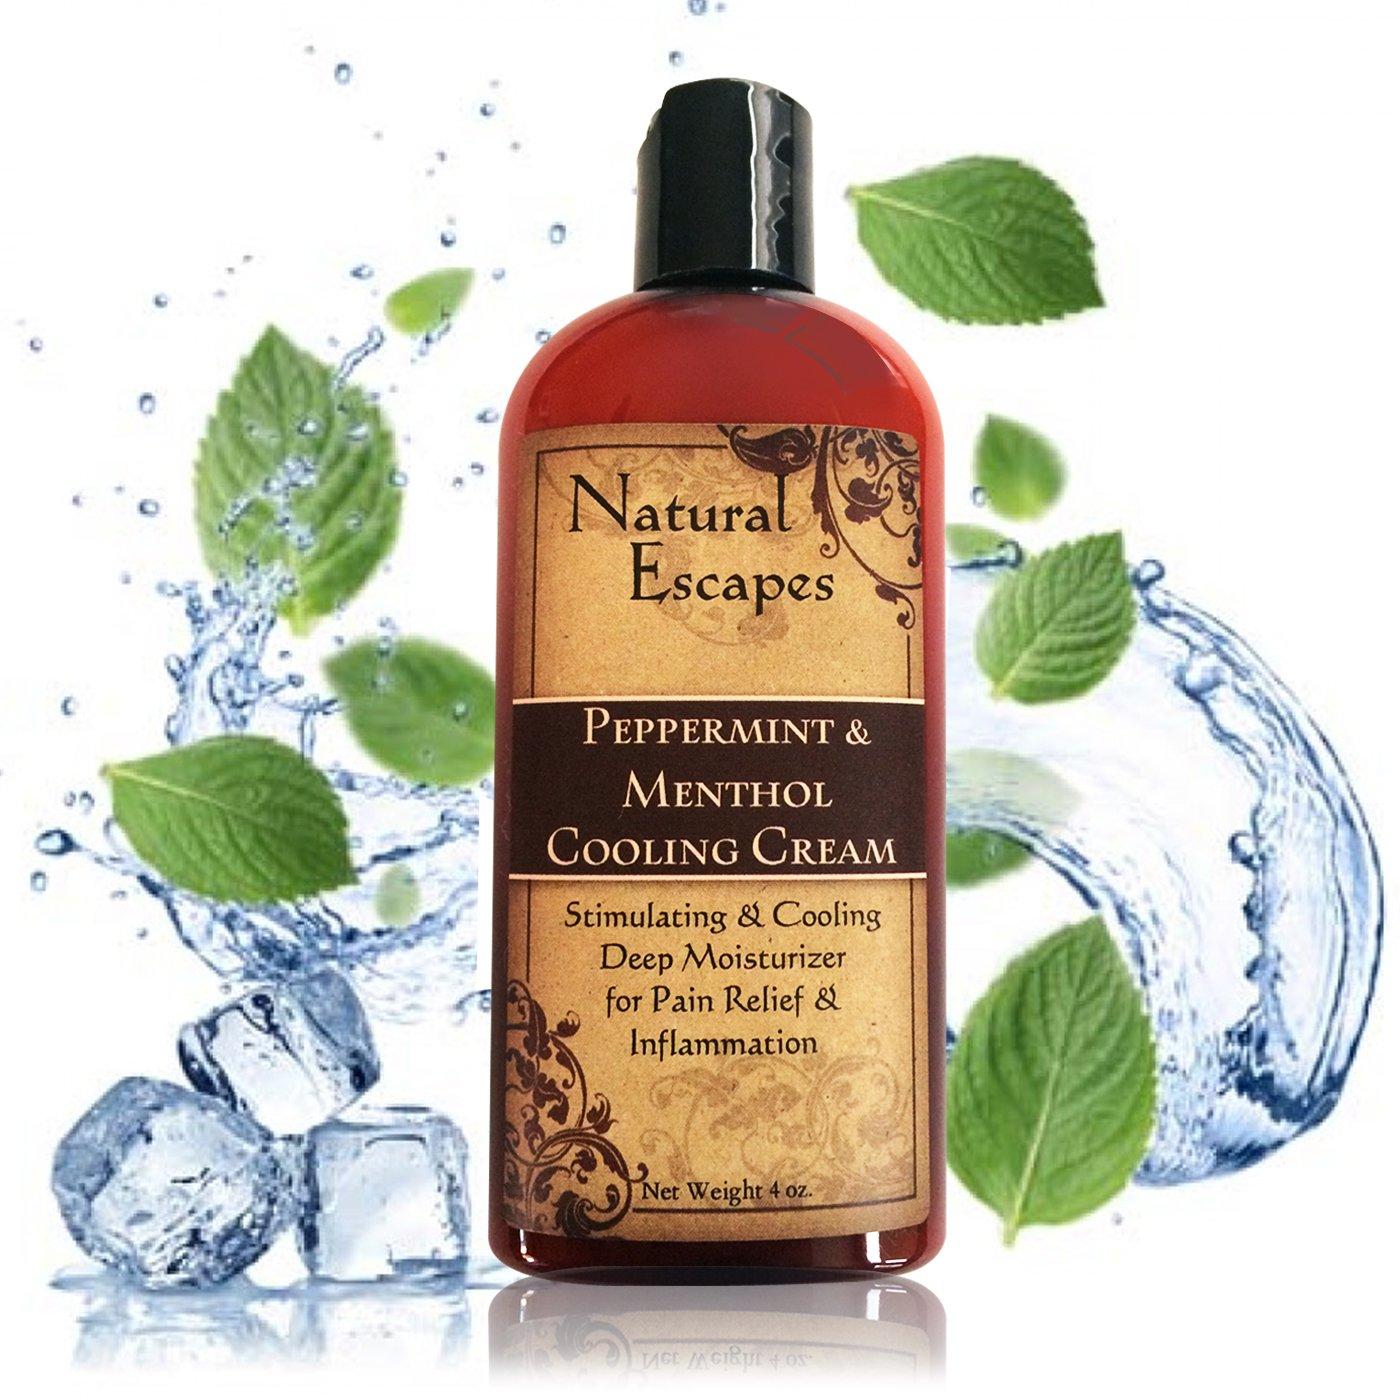 Organic Peppermint, Camphor & Menthol Cooling Cream   Natural Pain Relief Cream for Arthritis, Shingles, Foot Pain, Sciatica & More   Anti-Inflammatory Cream   4 oz